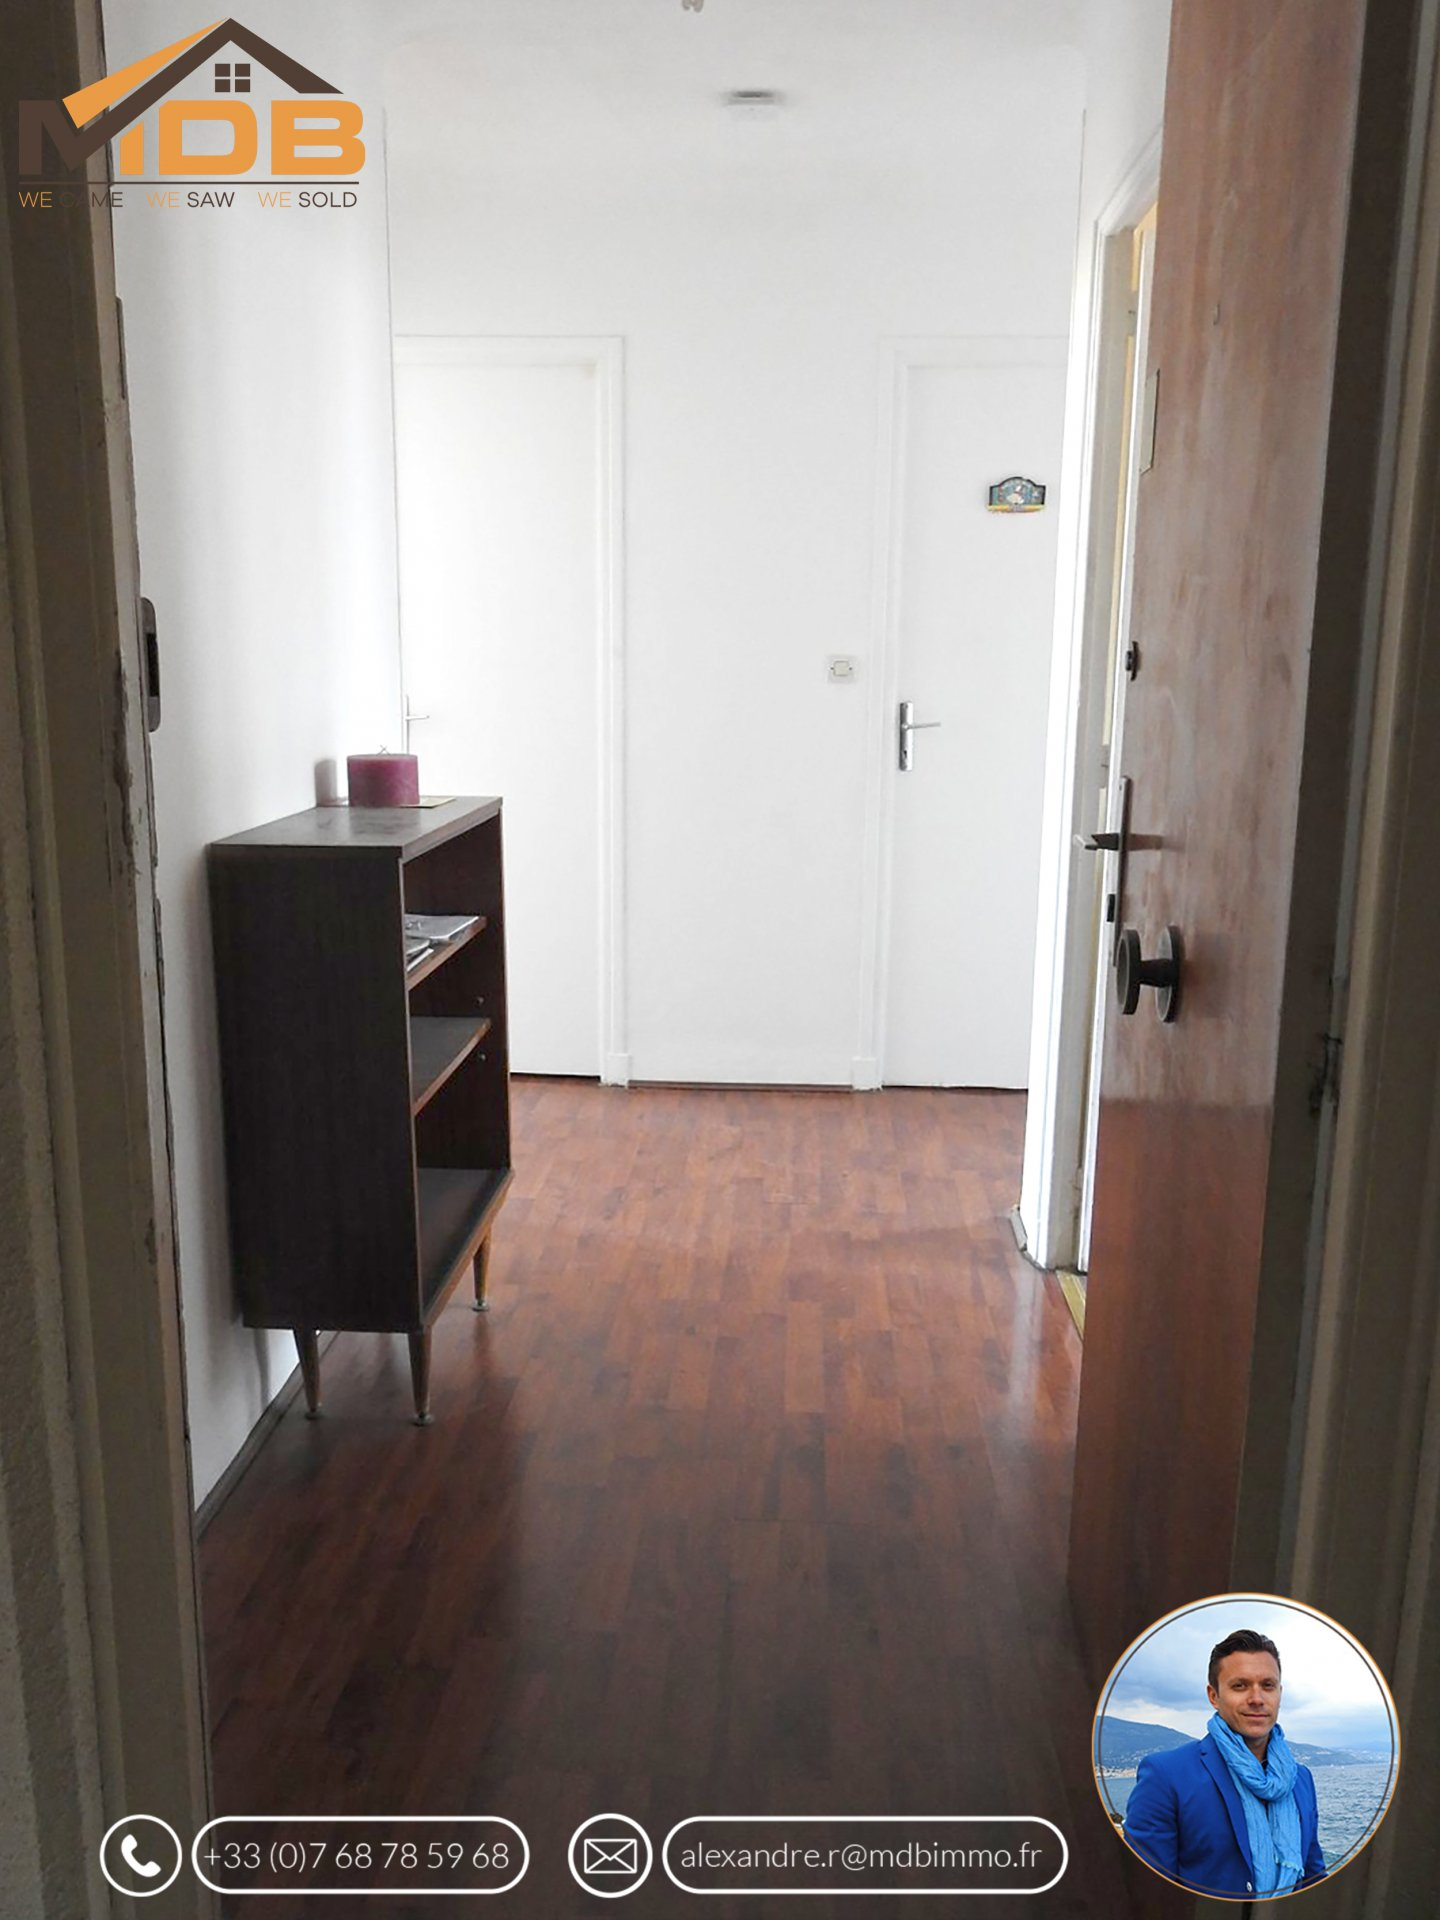 ROQUEBRUNE-CAP-MARTIN - Quartier Carnolès - APPARTEMENT 2P - 42.54m²